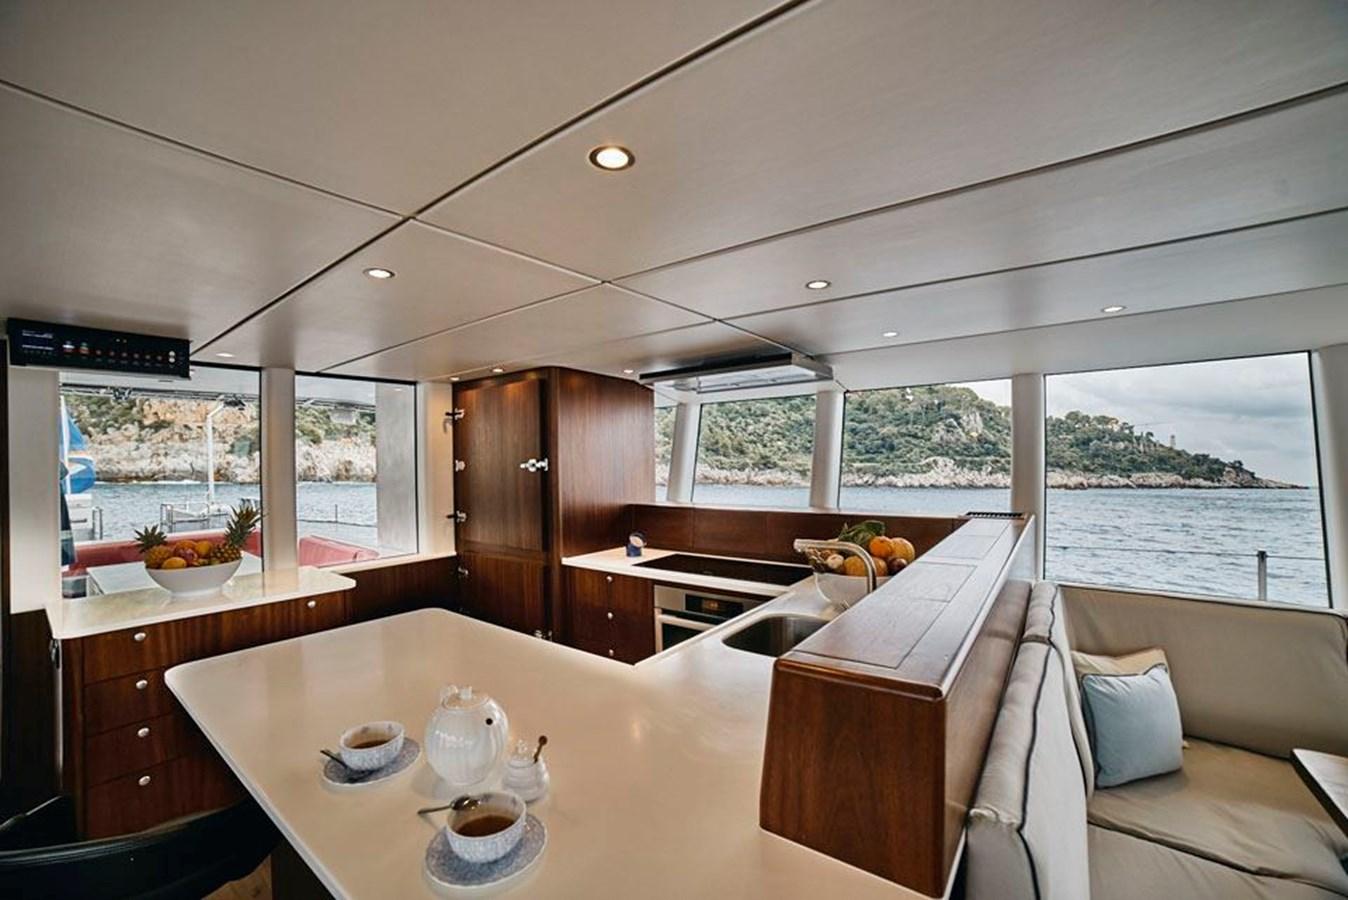 fpb-97-10 2014 CIRCA MARINE FPB 97 Motor Yacht 2788369